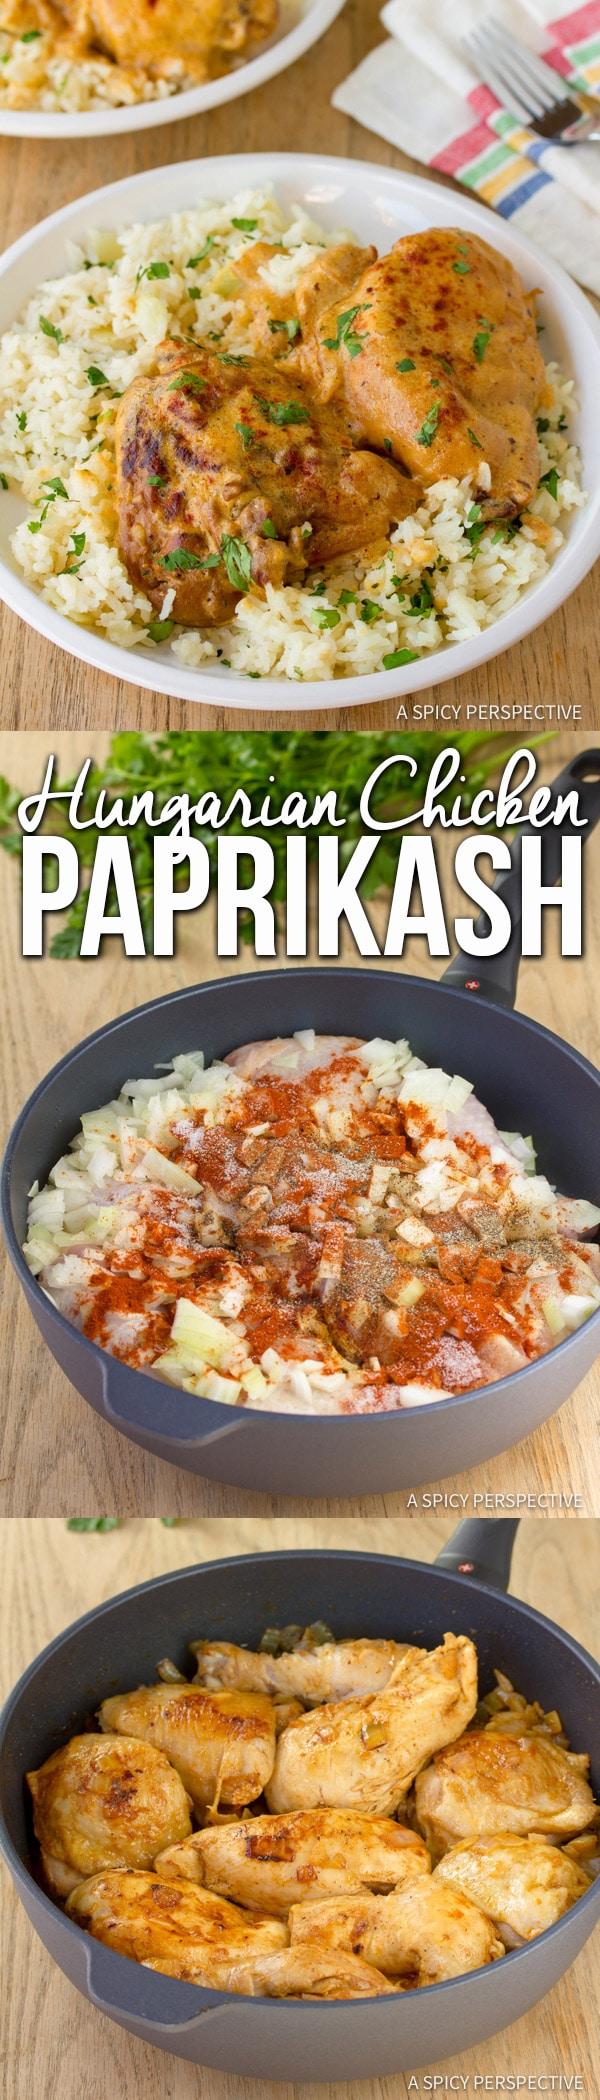 Creamy Hungarian Chicken Paprikash (Paprikas)   ASpicyPerspective.com